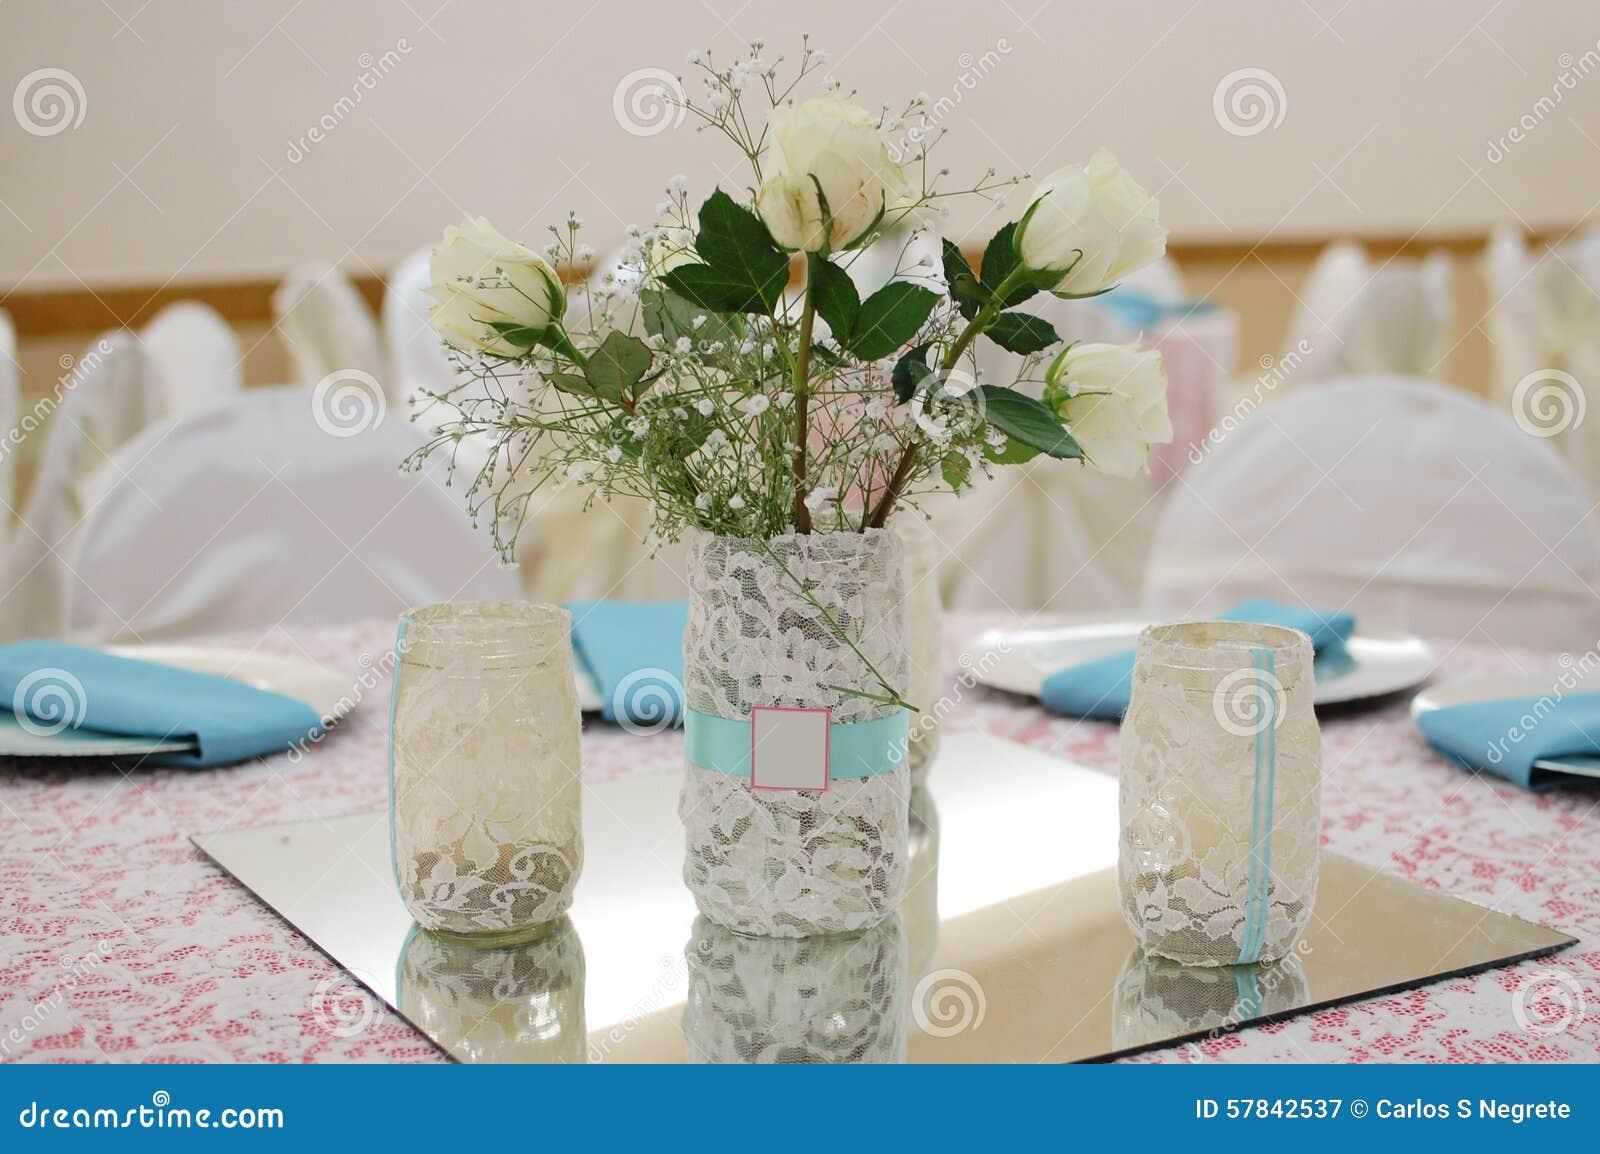 Flower vase decoration my web value gold home vase flower vase flower basket rattan vase decoration reviewsmspy